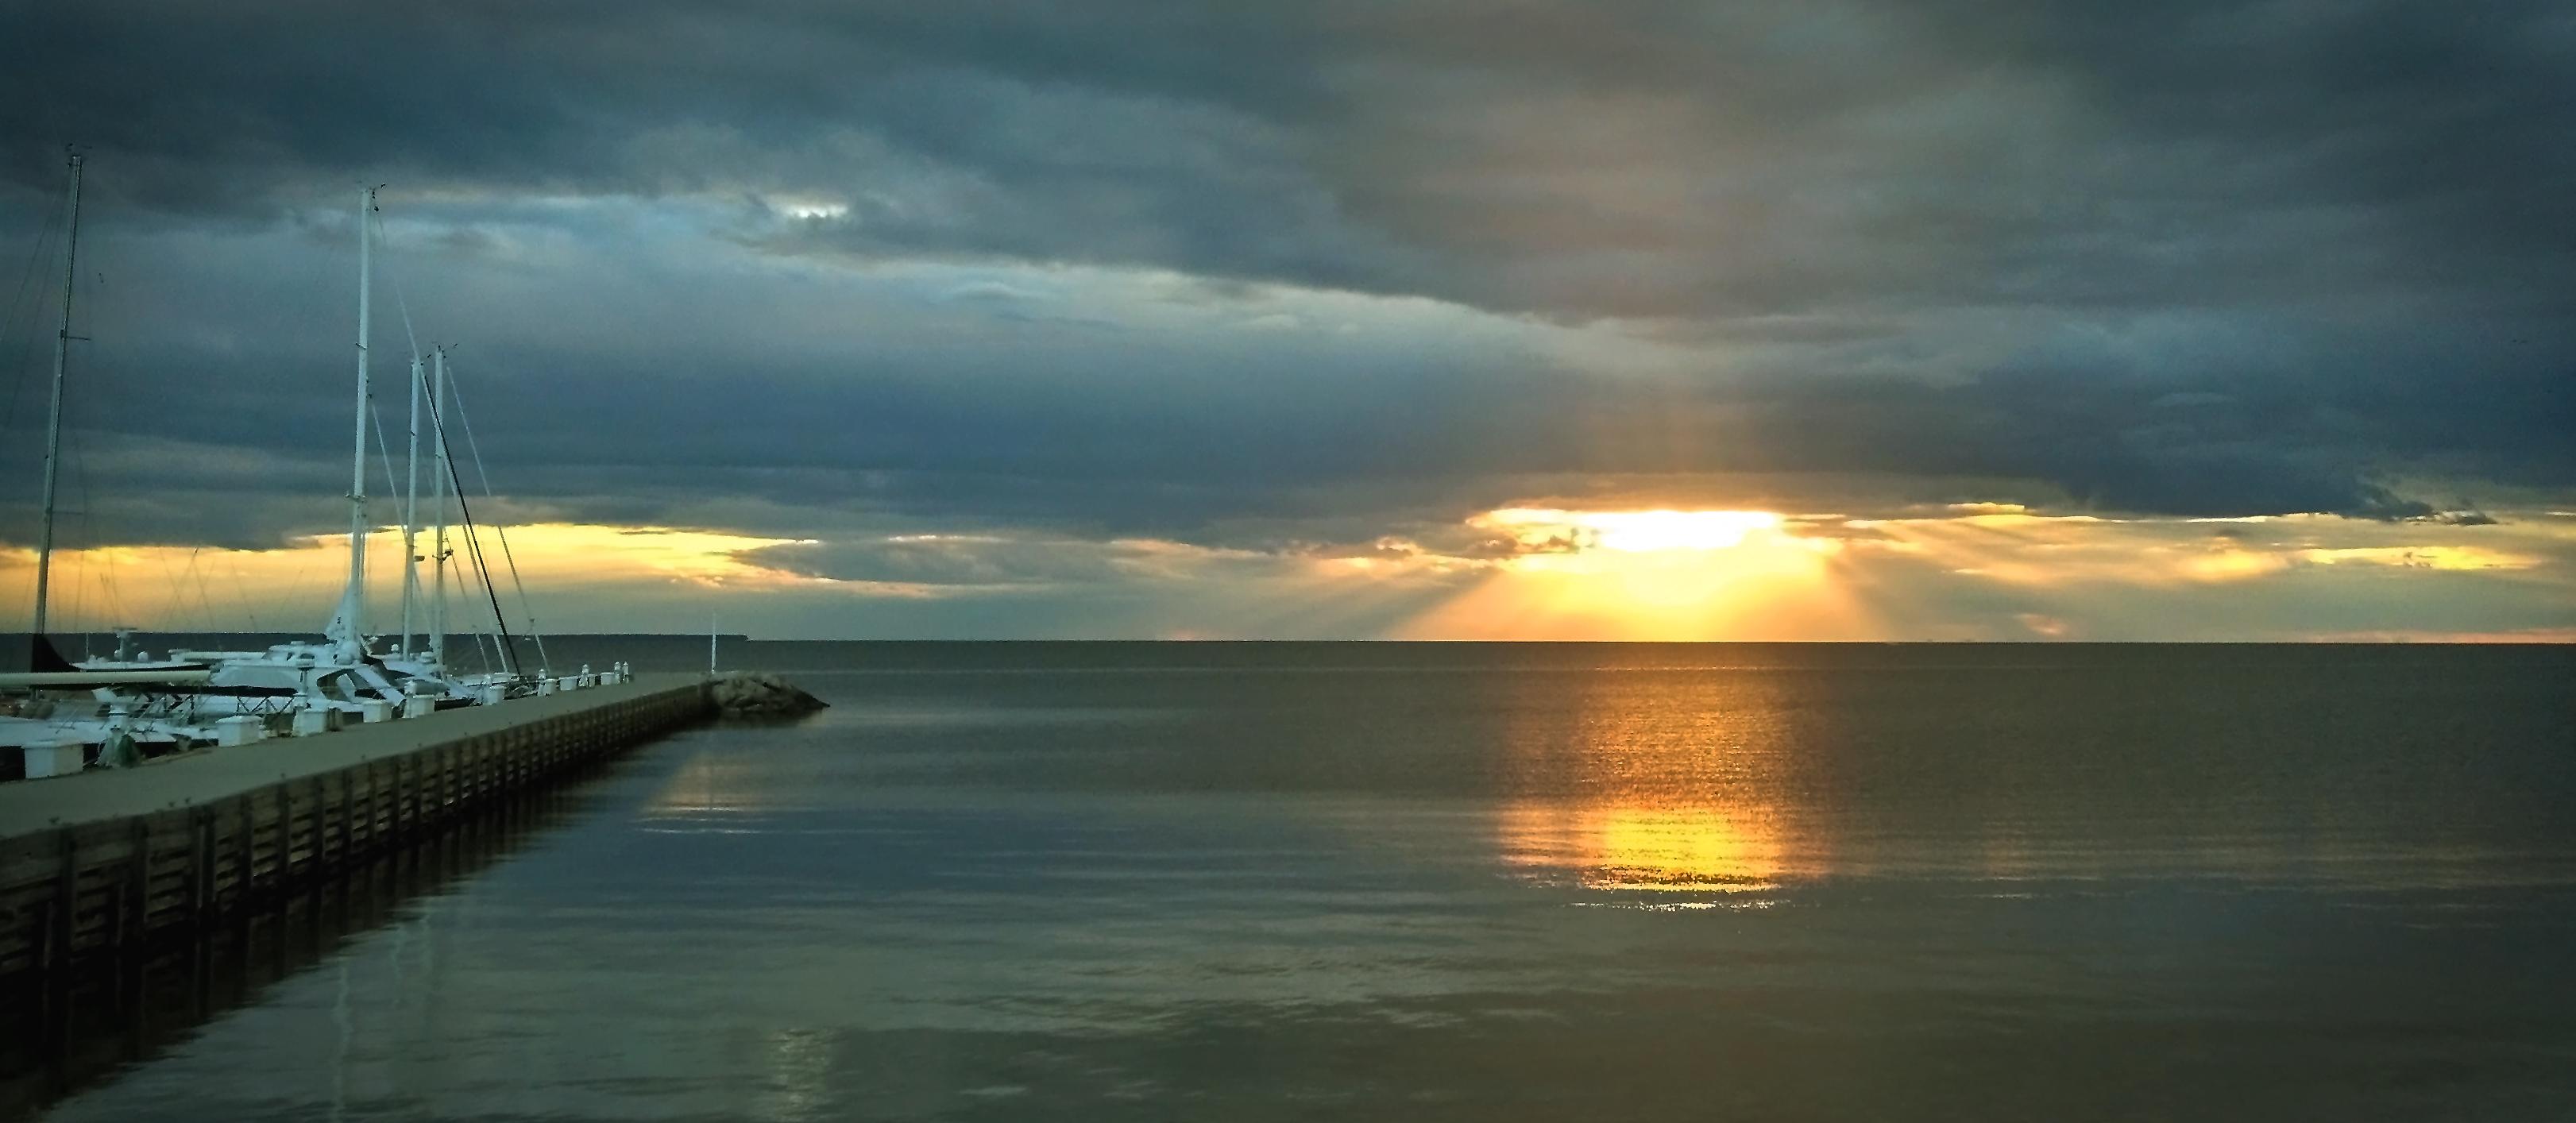 aniv sunset jl13